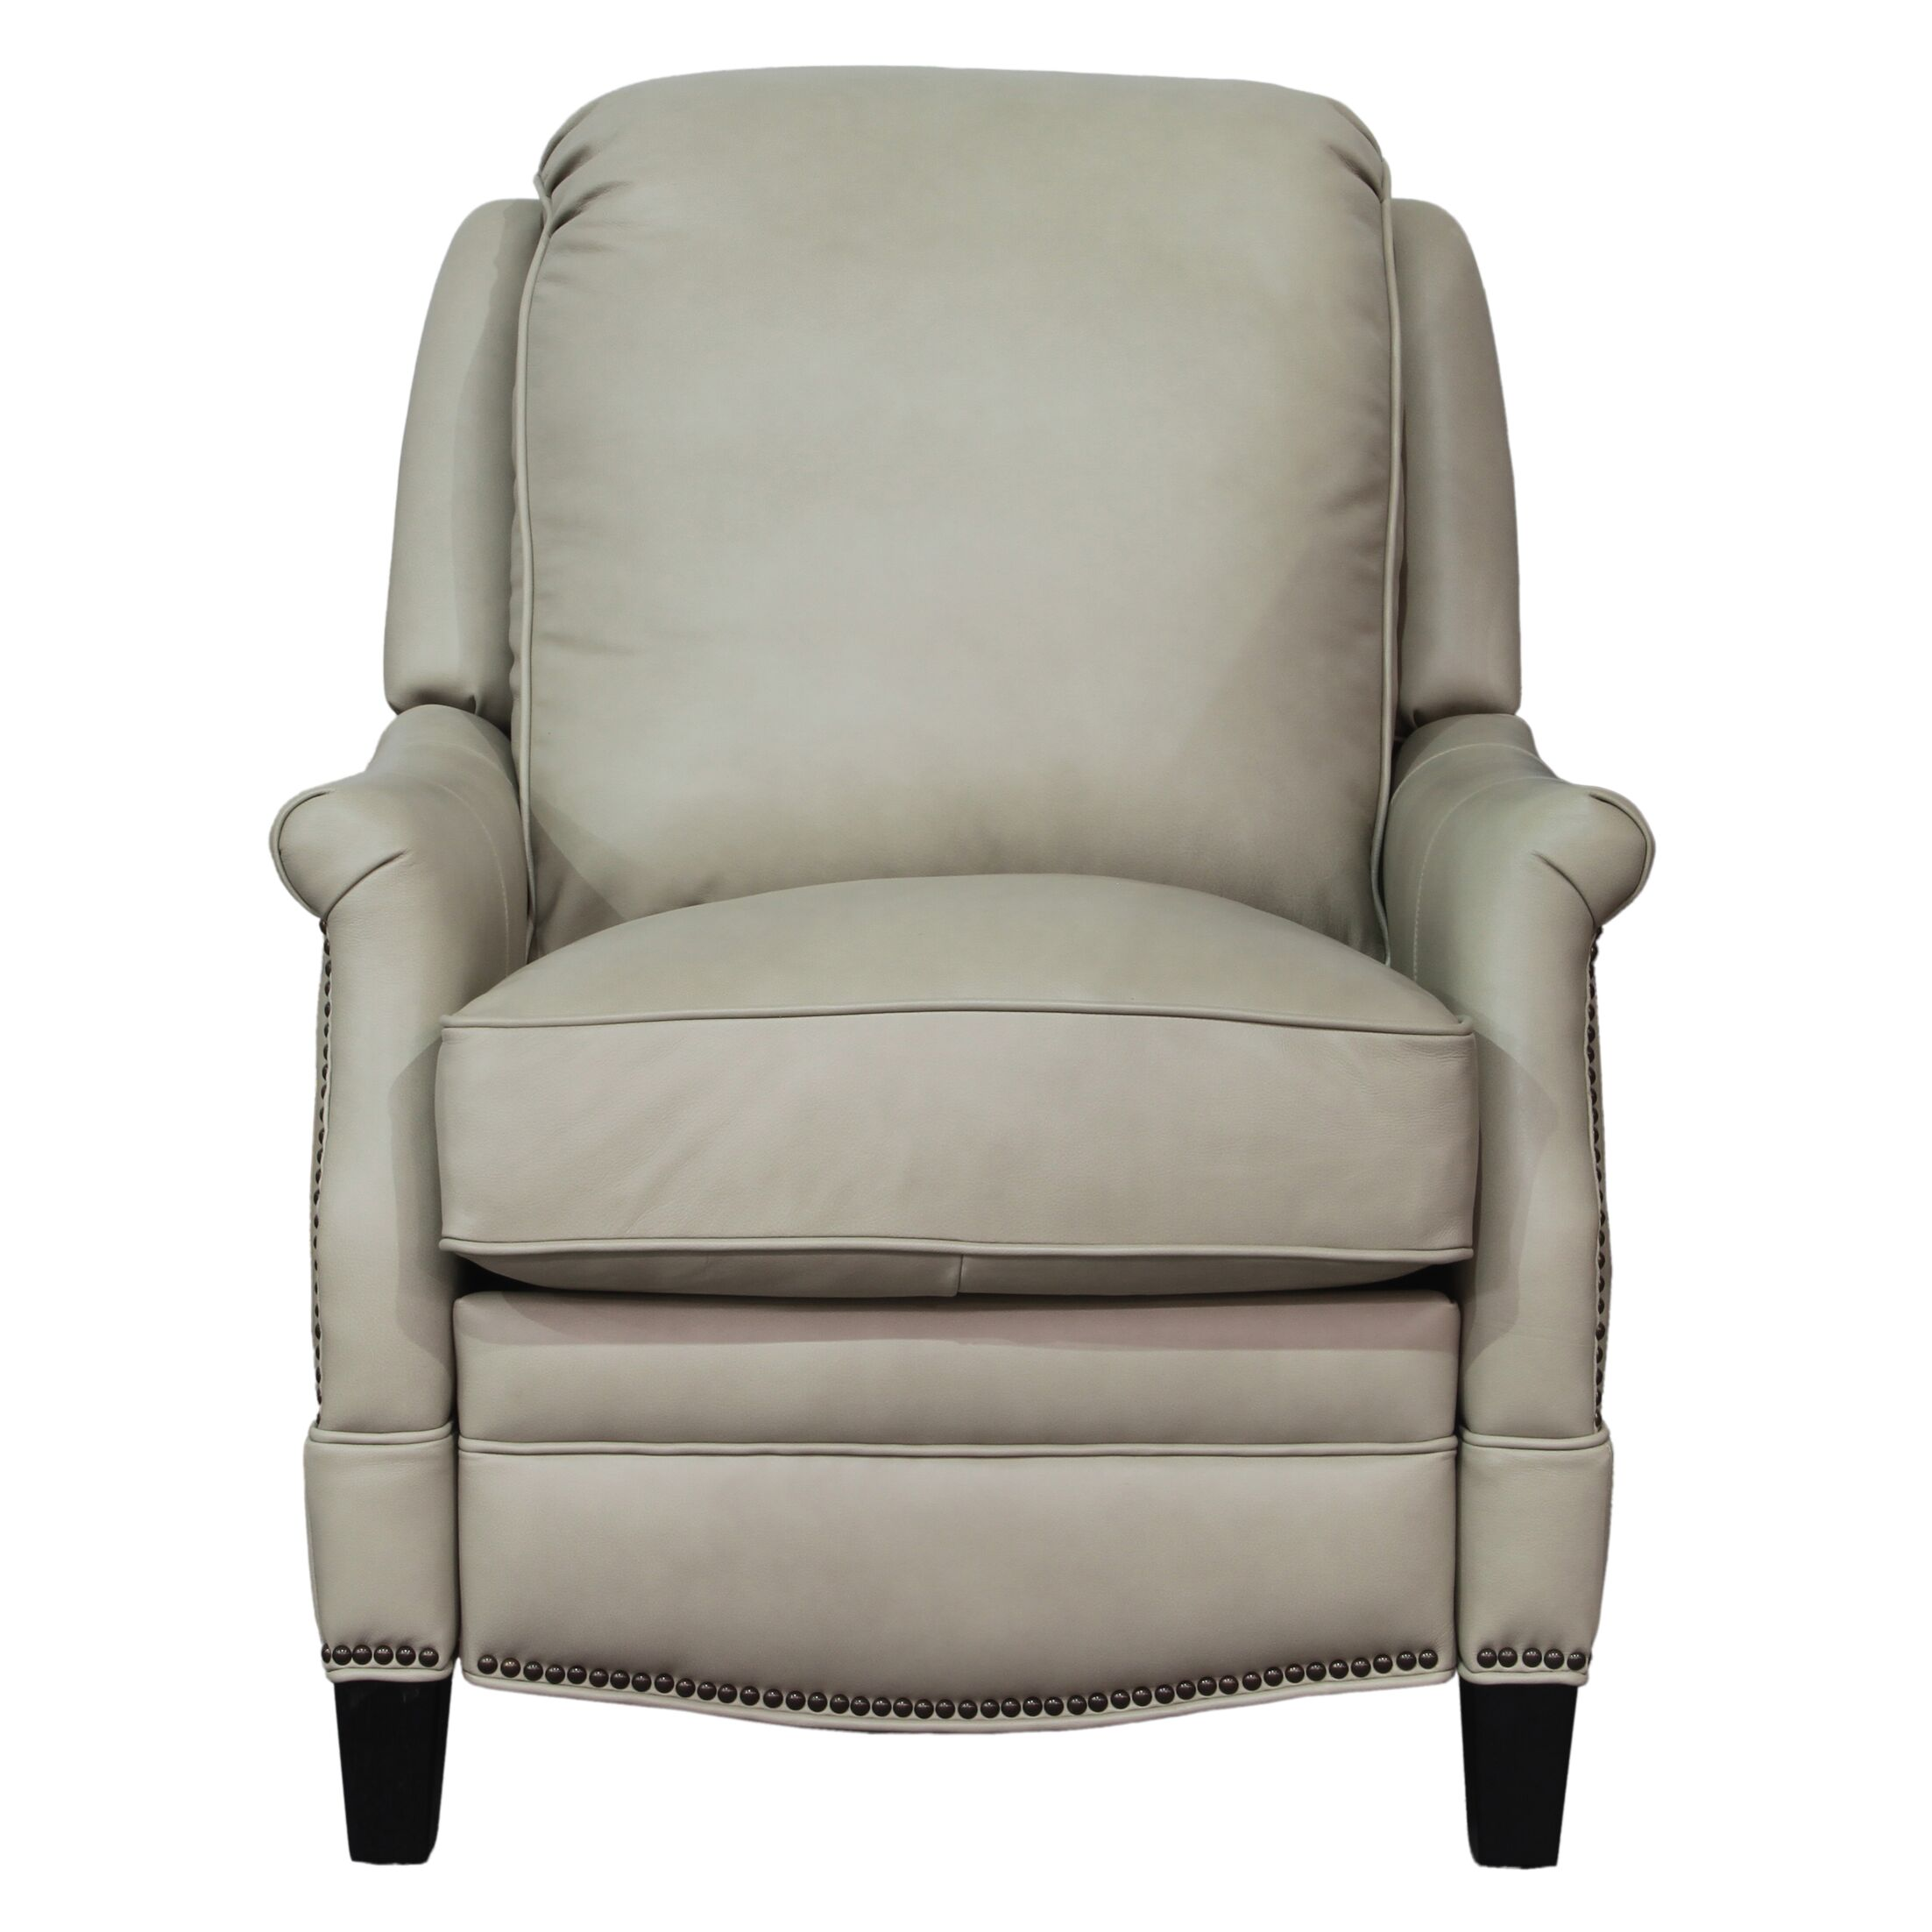 Ashebrooke Leather Manual Recliner Upholstery: Shoreham Cream